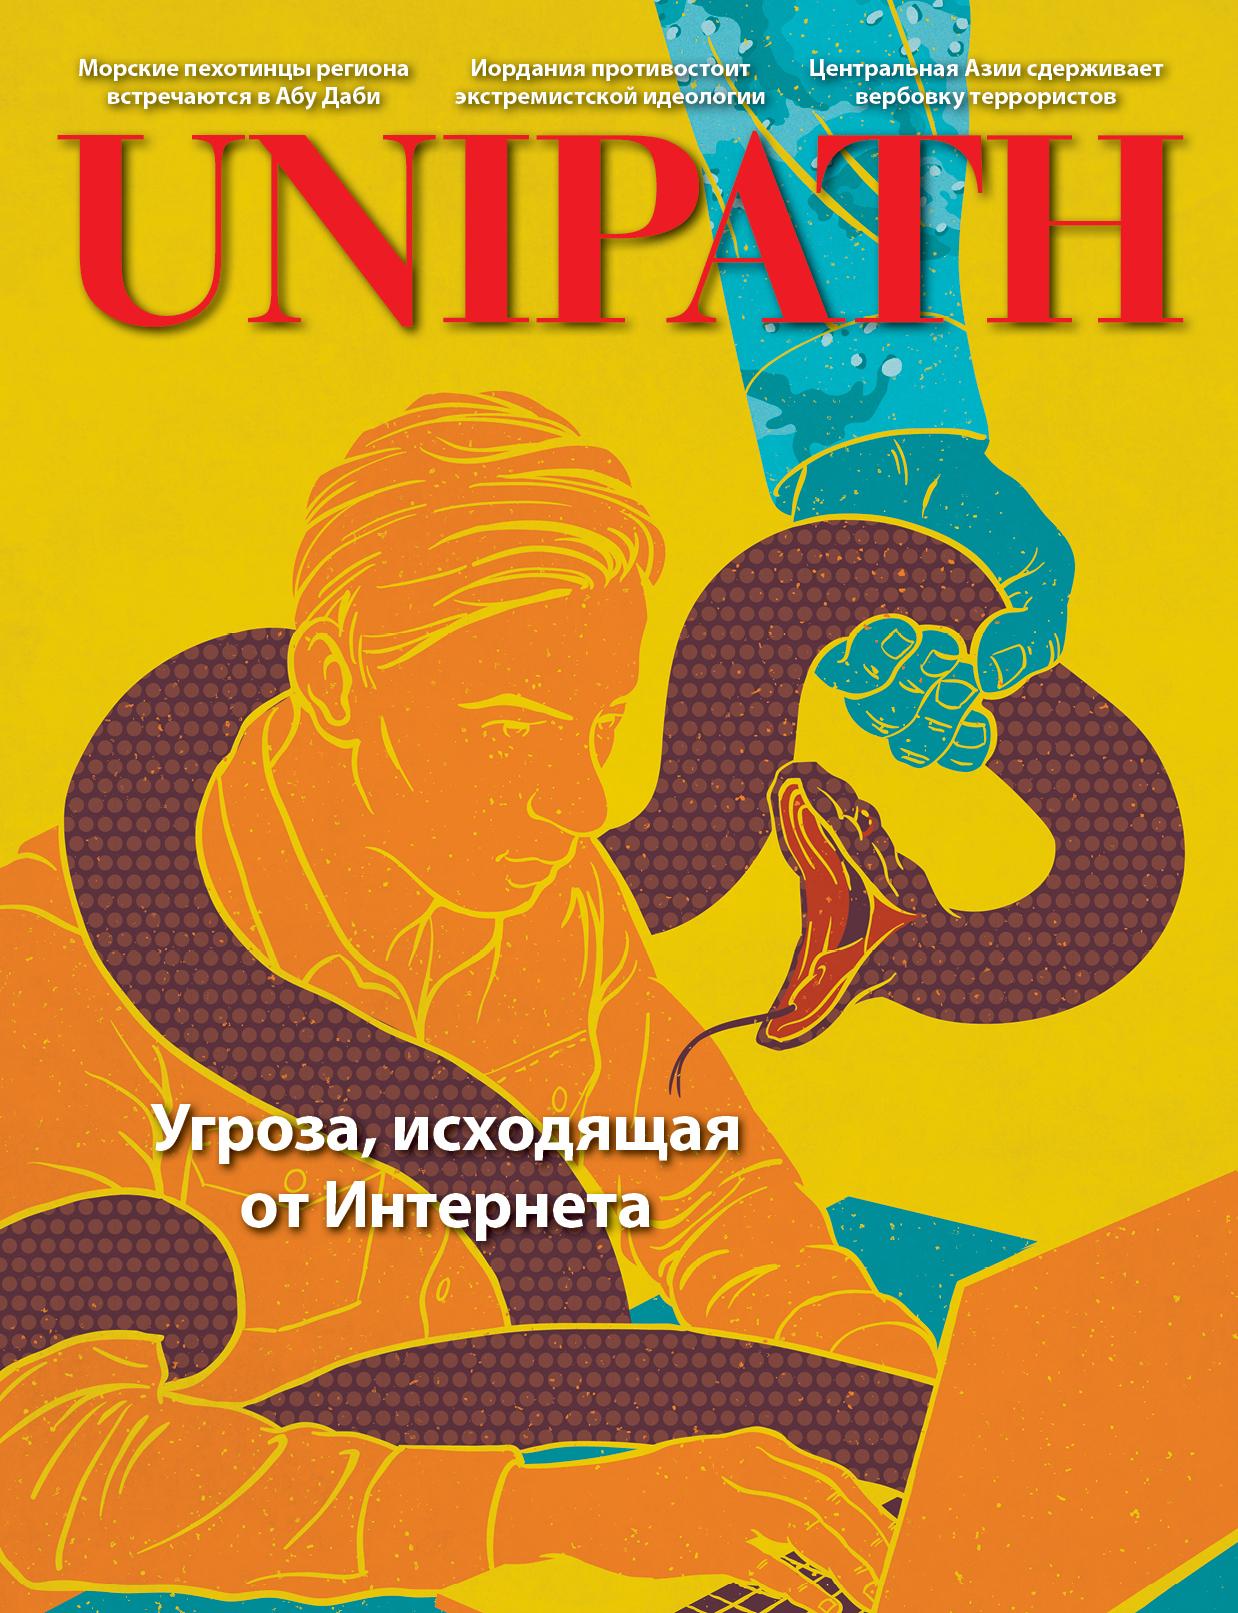 Unipath-V9N1-Standard-RussianCover